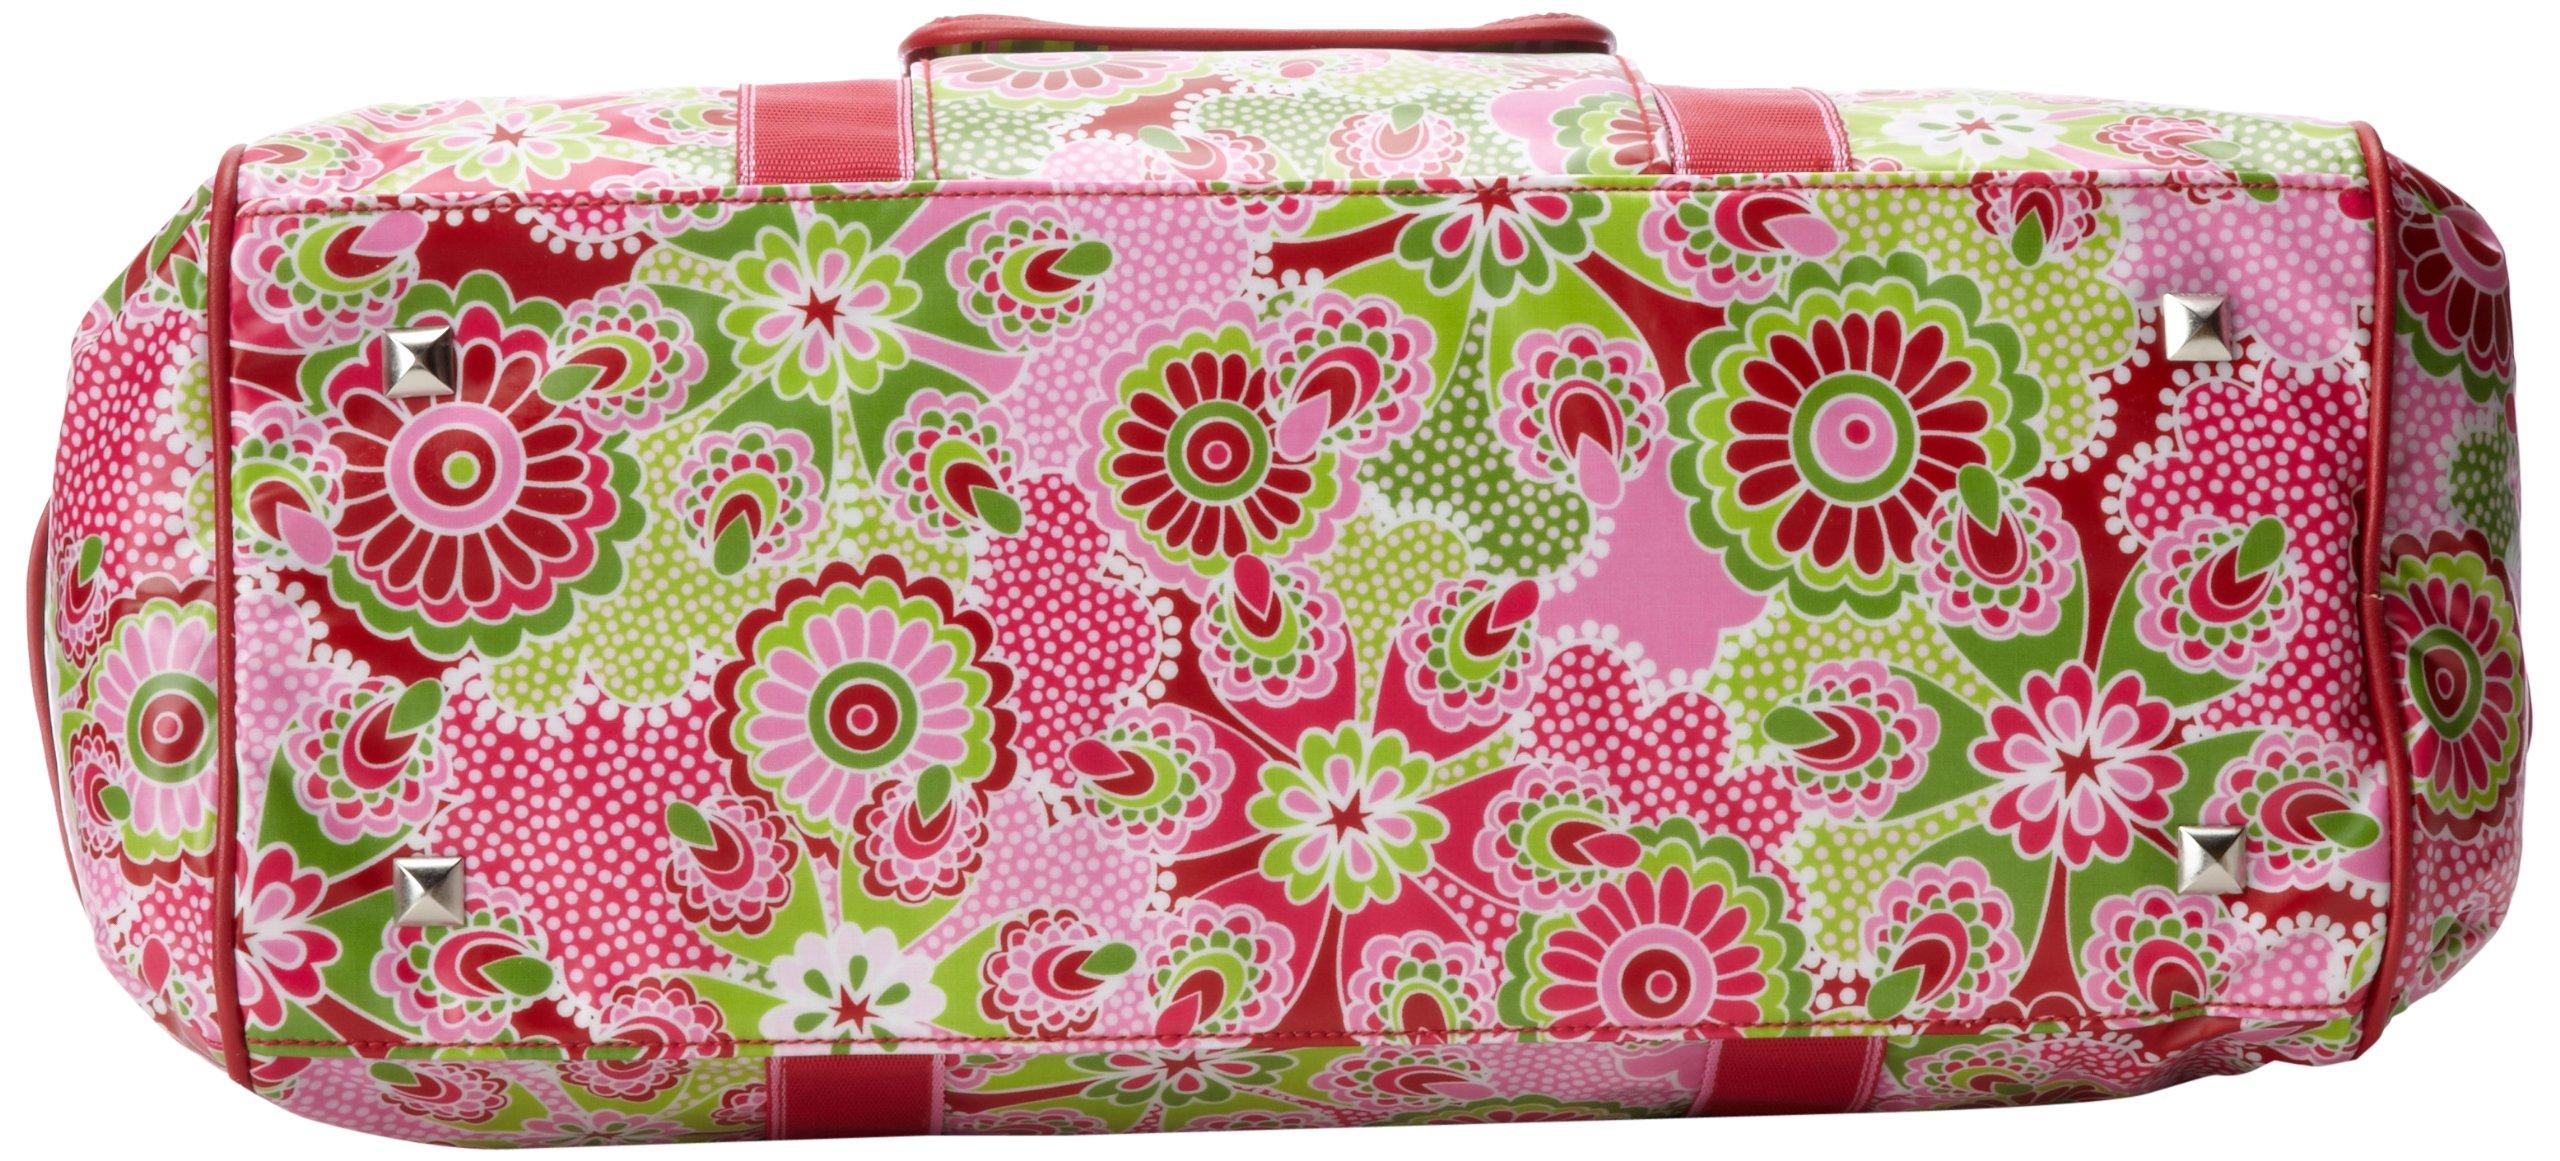 Hadaki Cool HDK826 Duffle Bag,Jazz Ruby,One Size by HADAKI (Image #5)